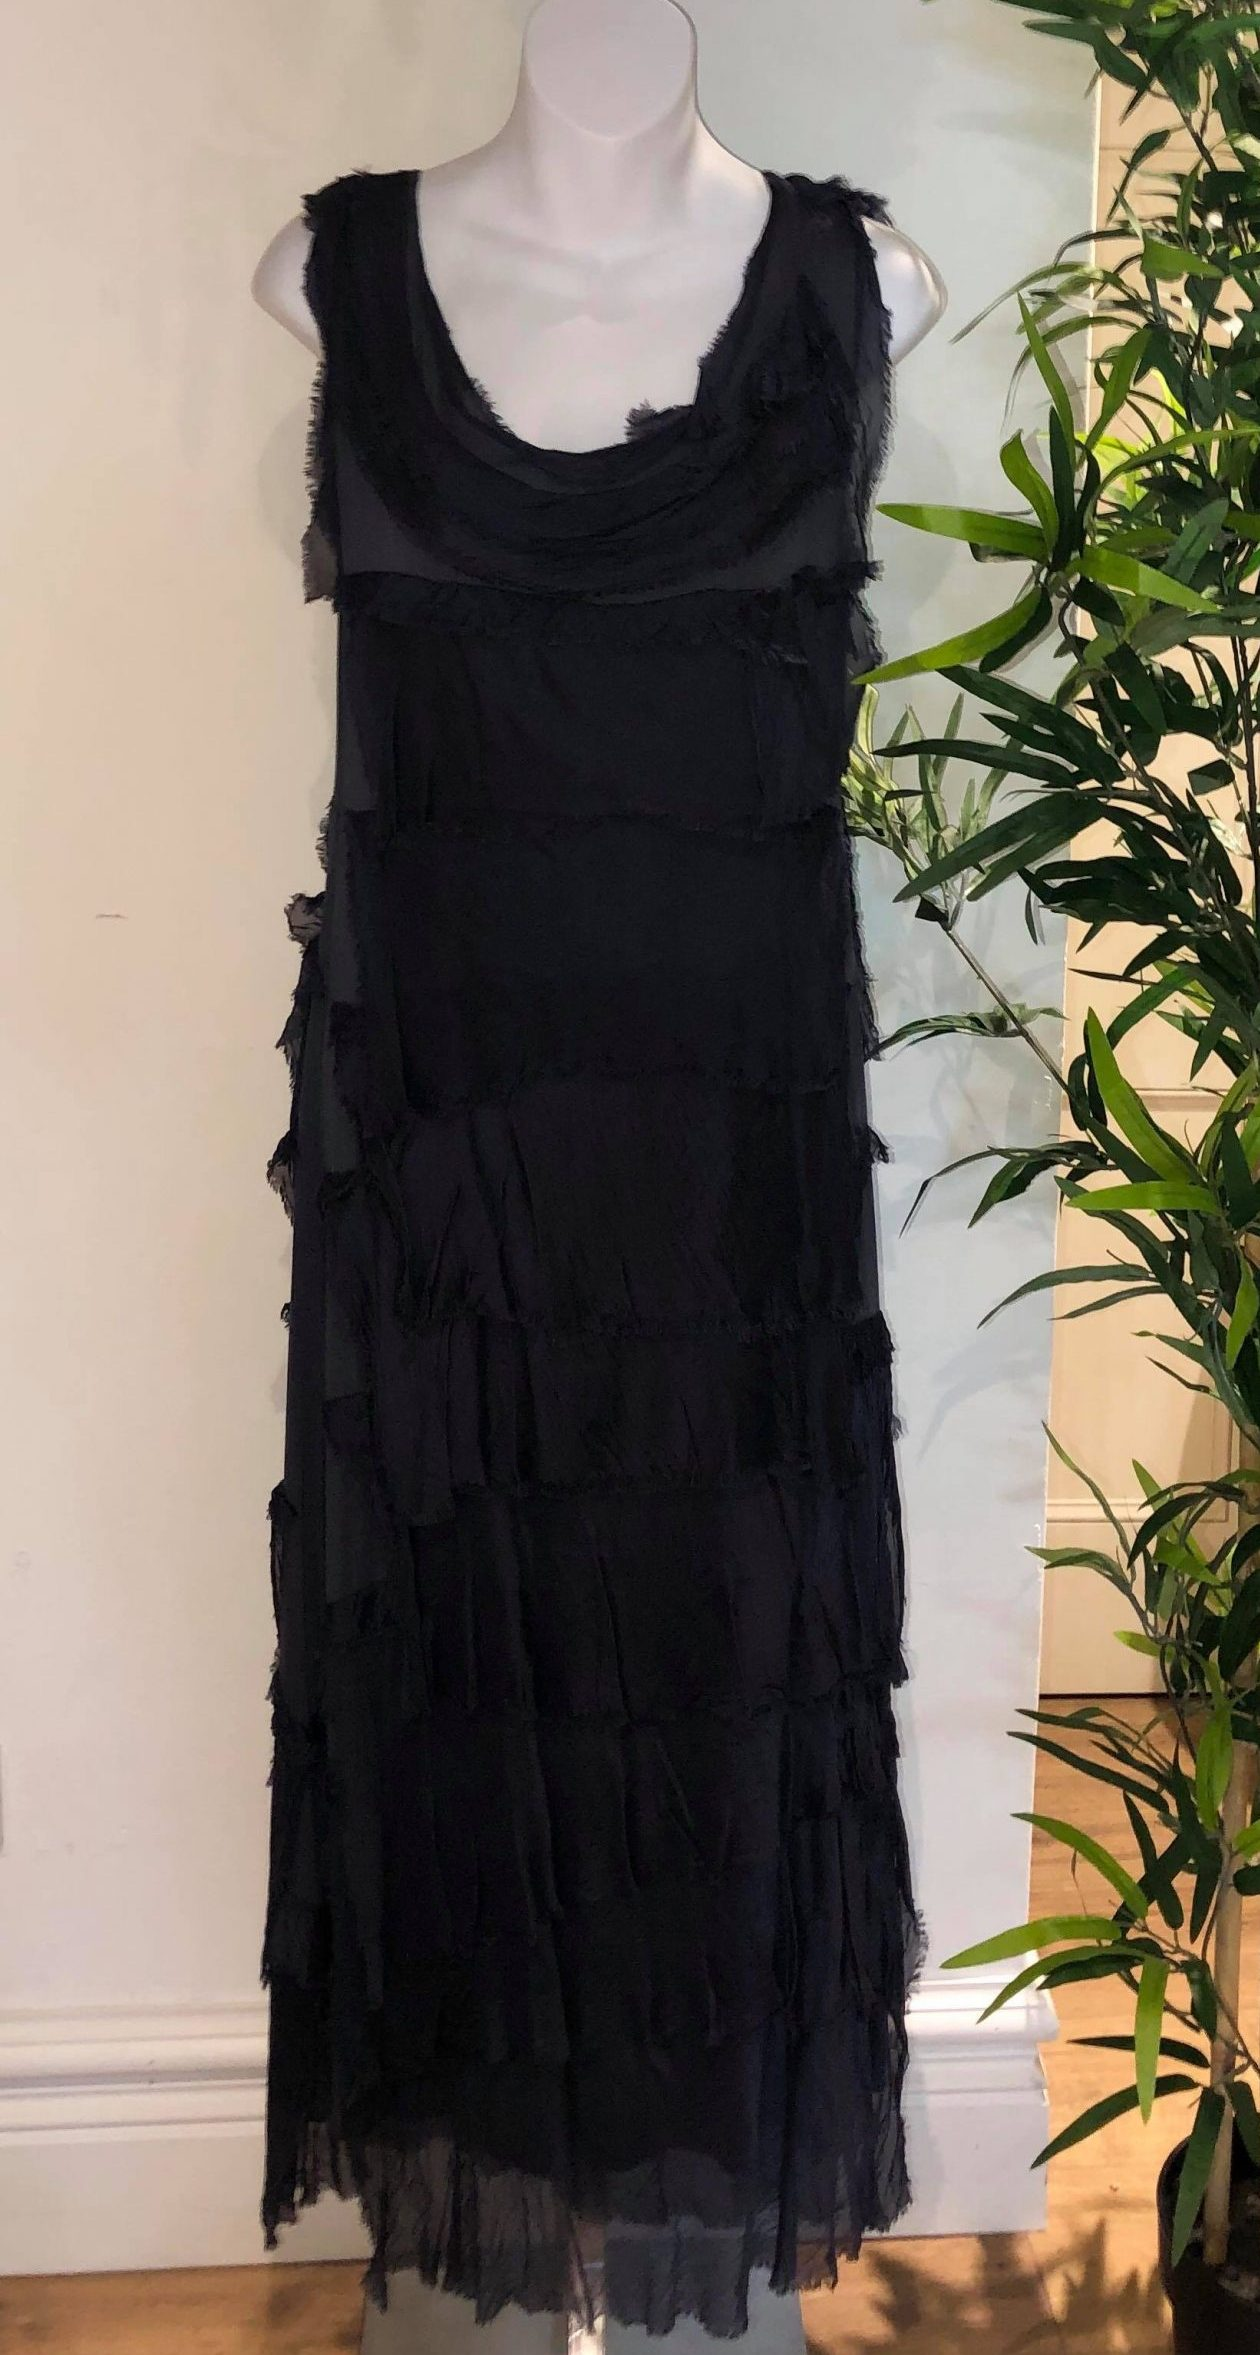 Navy ruffle dress